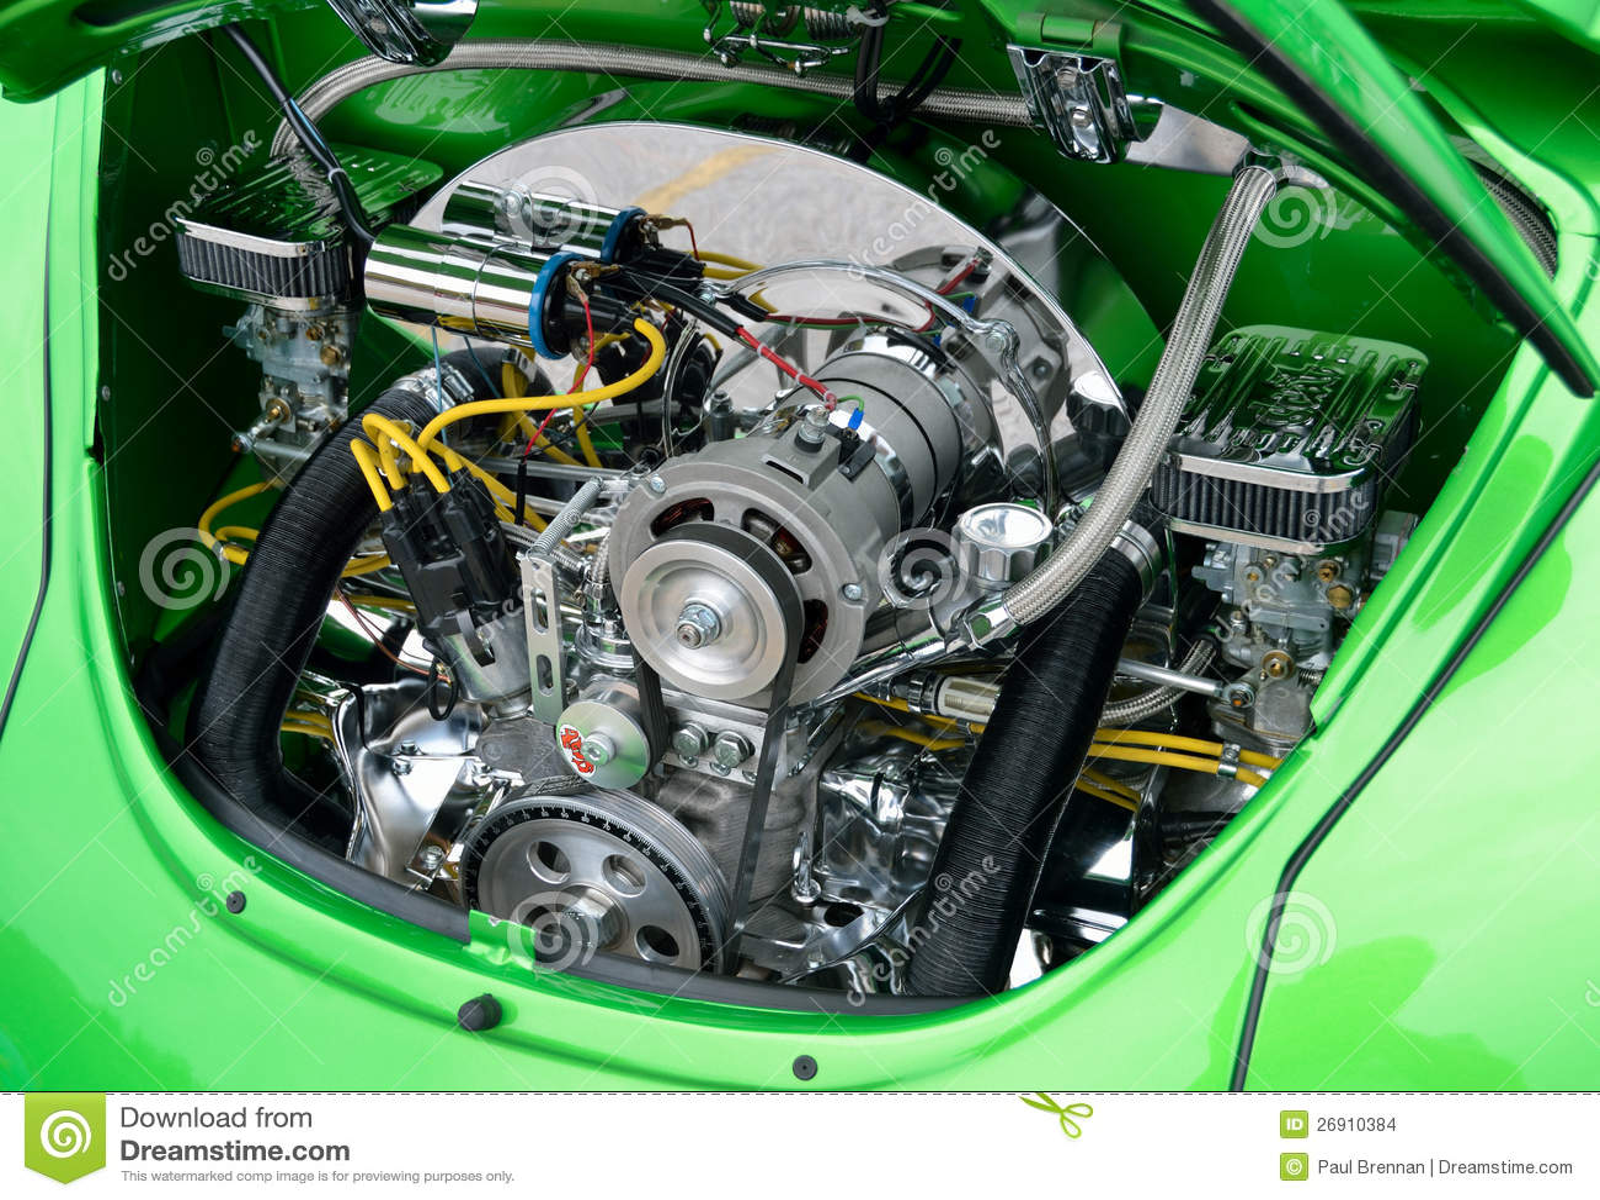 1972 Vw Beetle Engine Diagram Wiring Diagram Verison Verison Lastanzadeltempo It